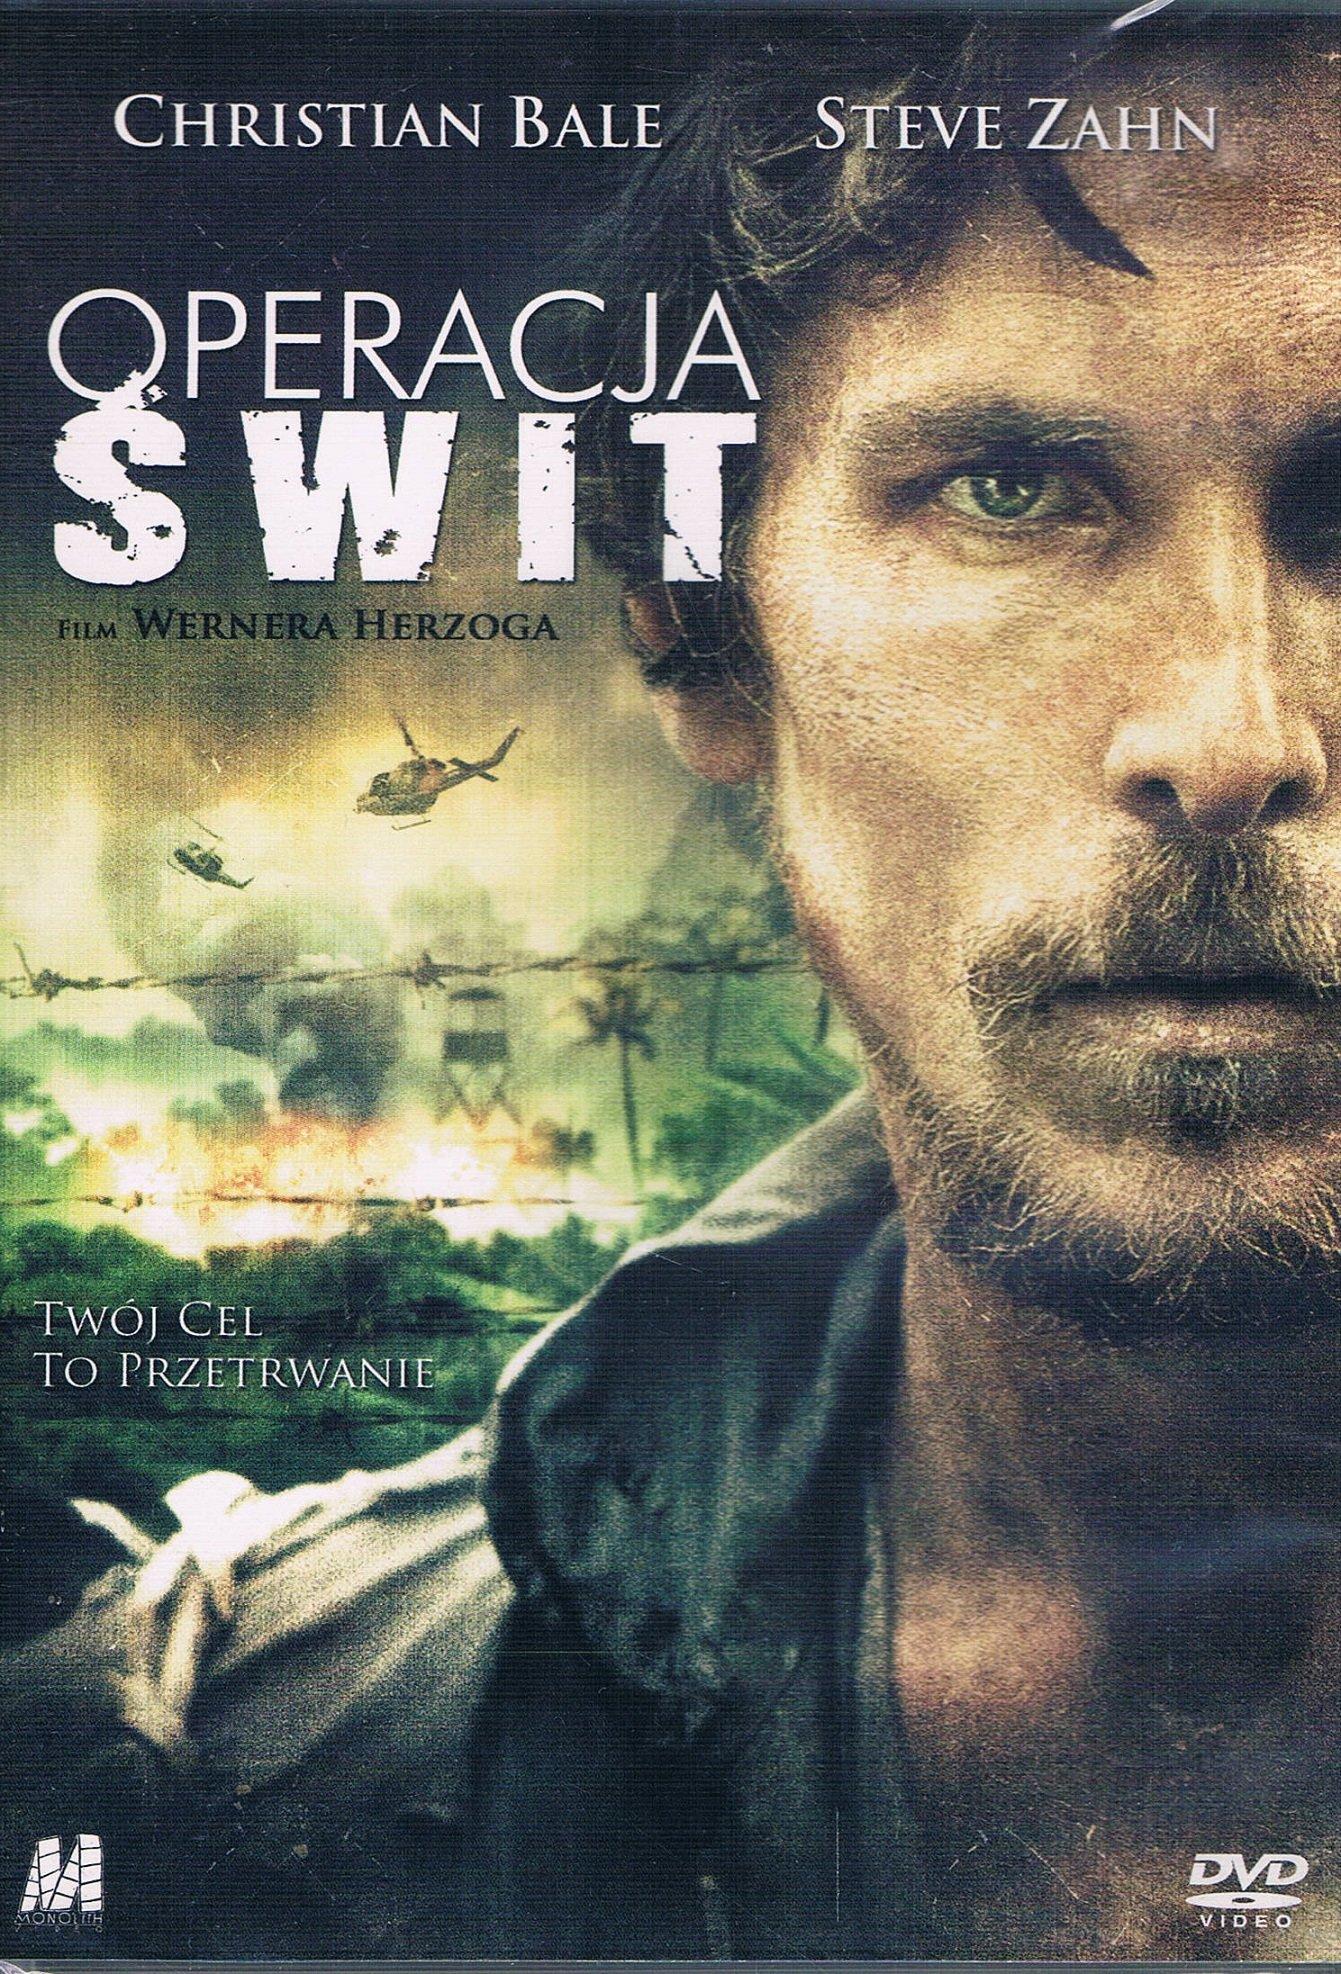 OPERACJA ŚWIT [DVD] CHRISTIAN BALE